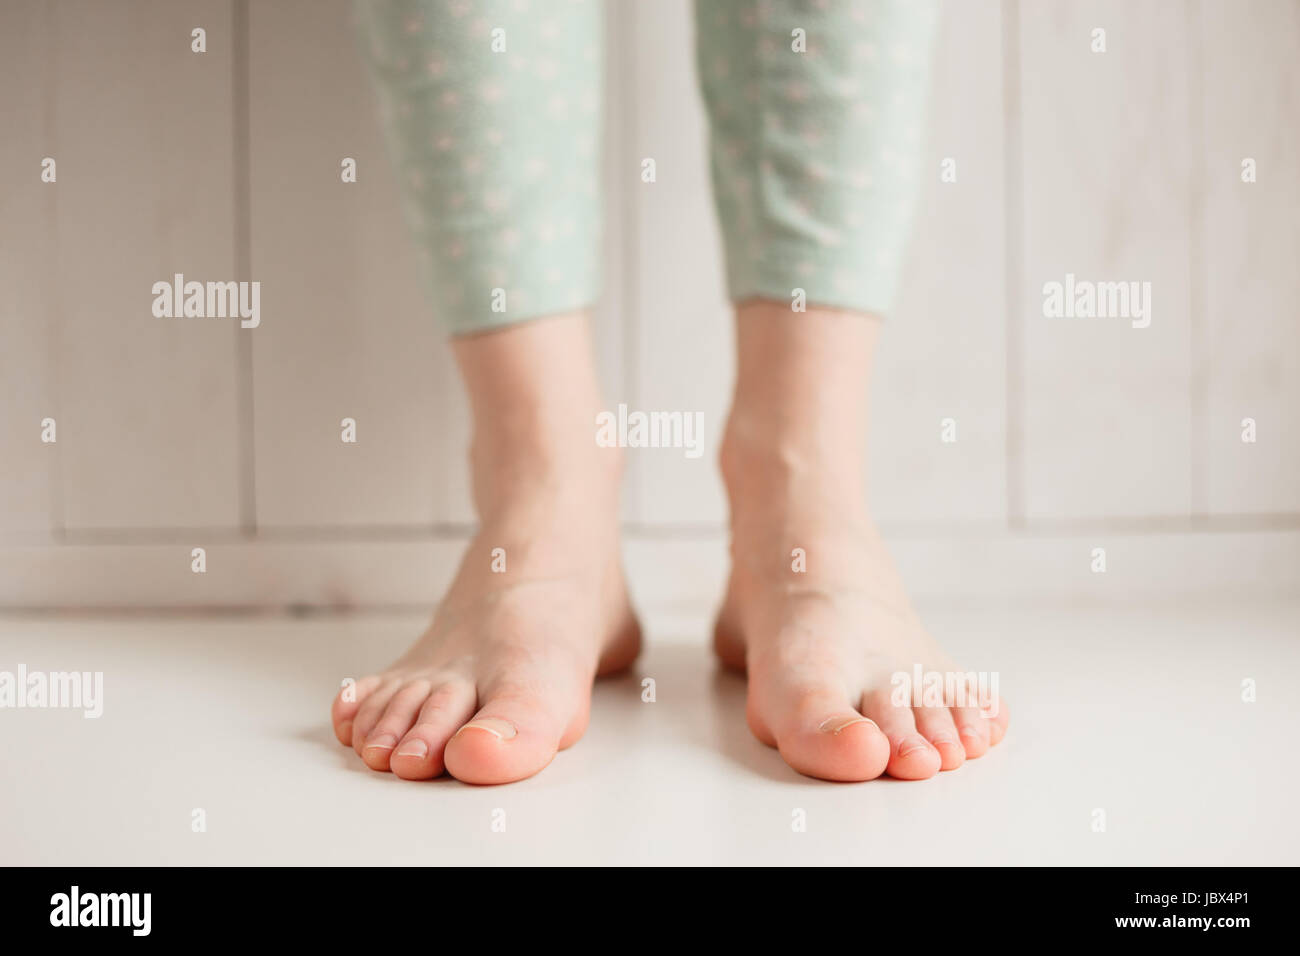 I piedi nudi di una ragazza stanchi di scomodi panni, close-up. Immagini Stock